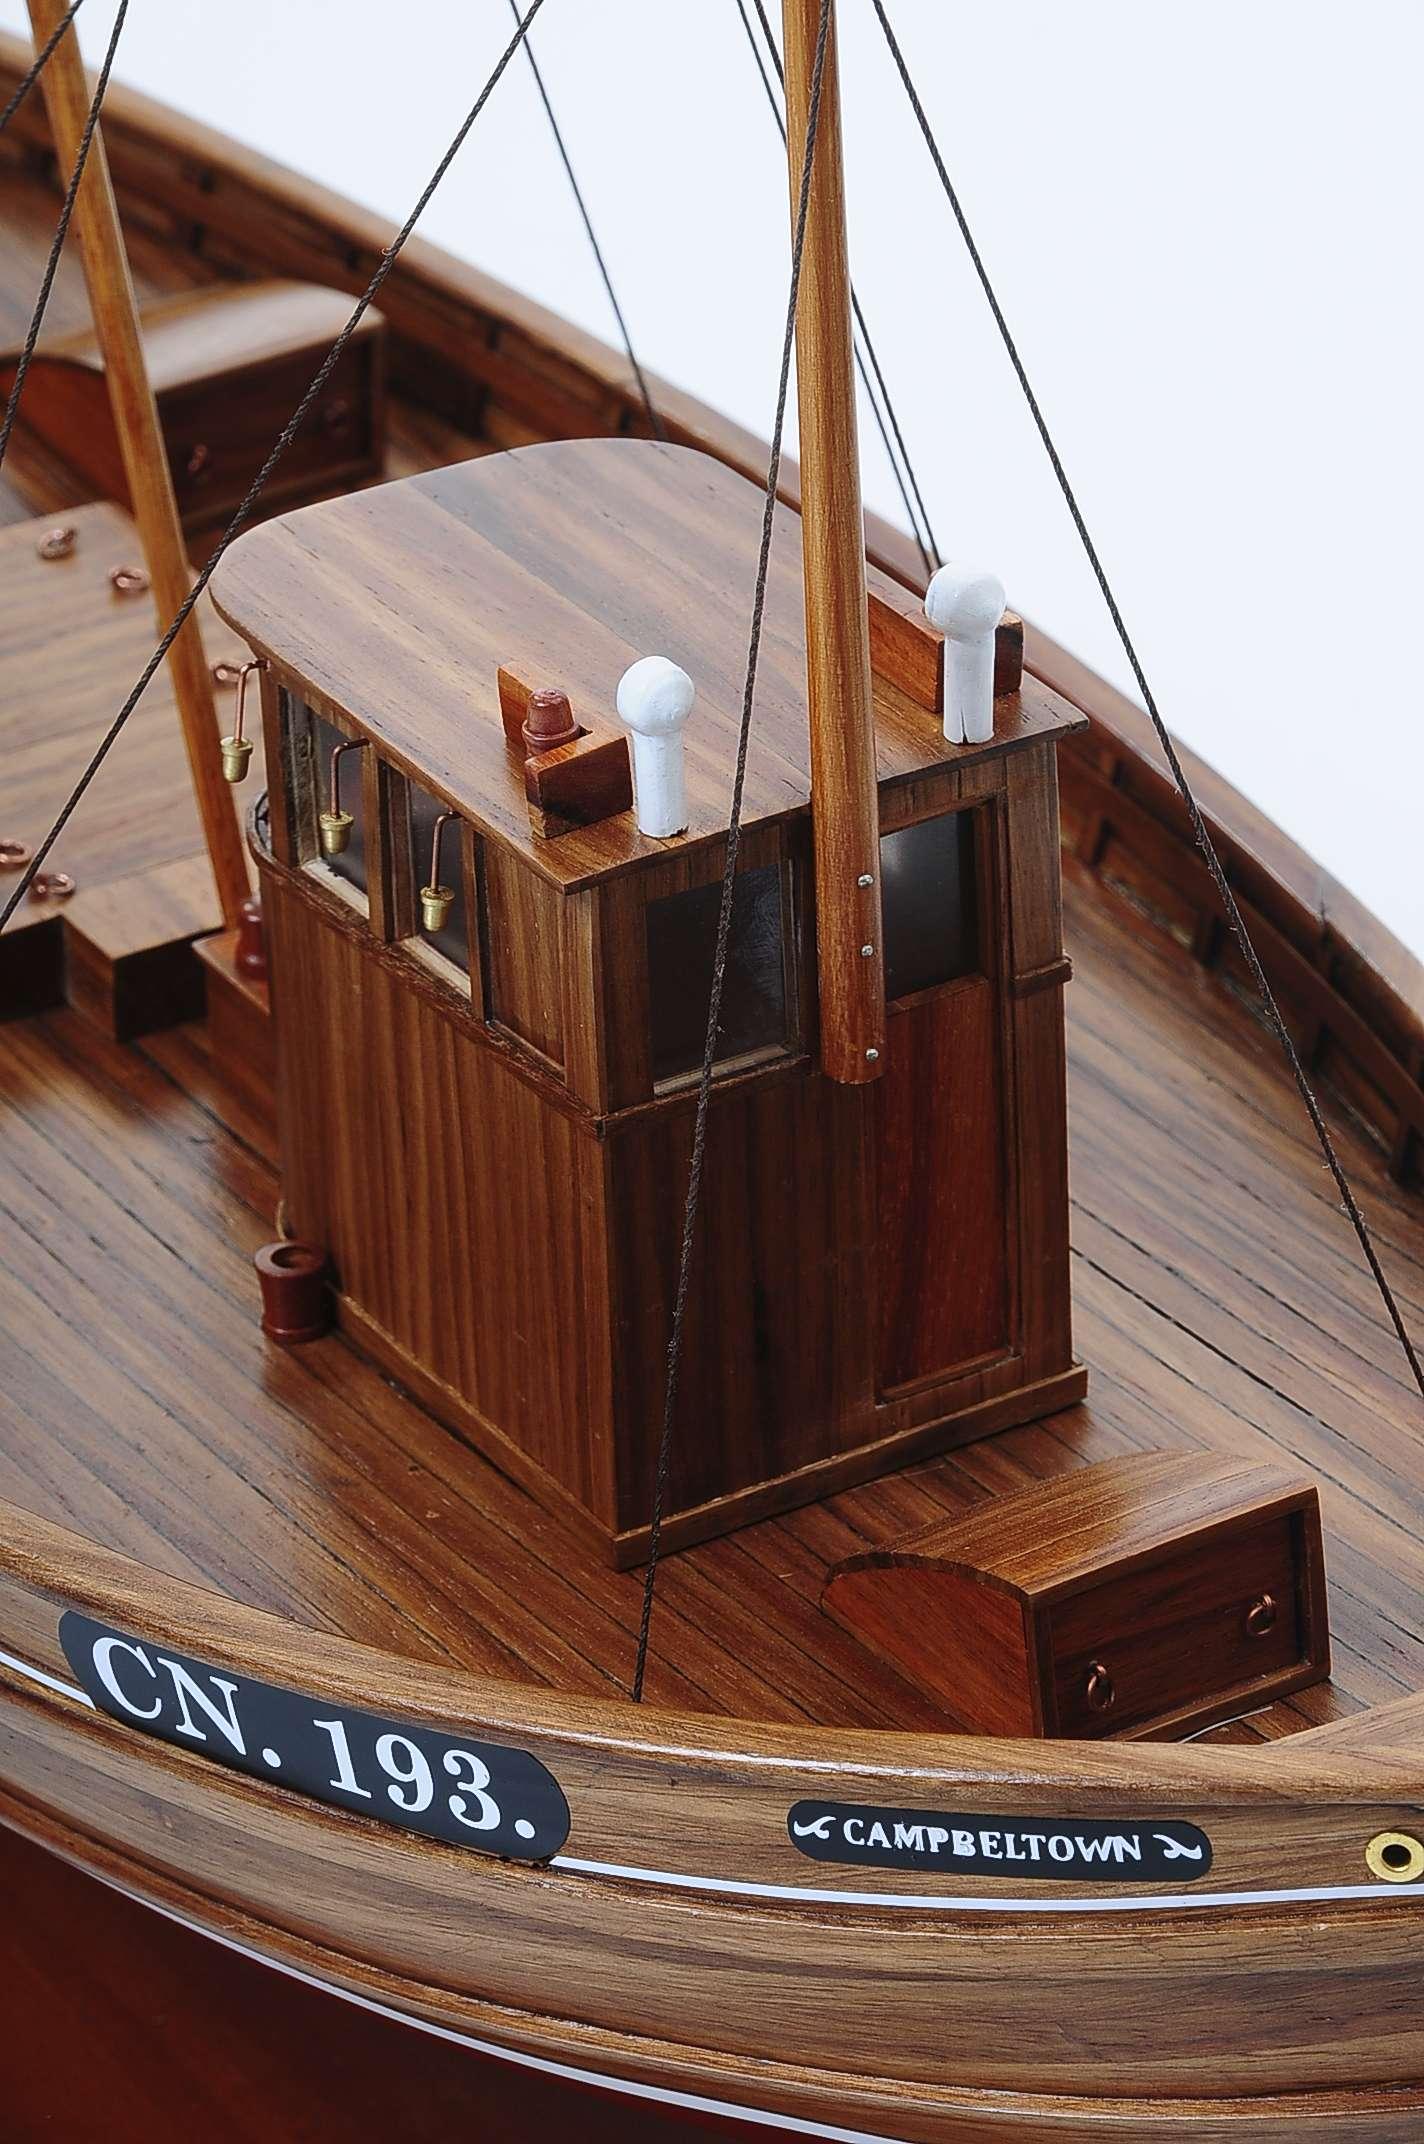 1431-4561-Mary-Mclean-CN193-Model-Boat